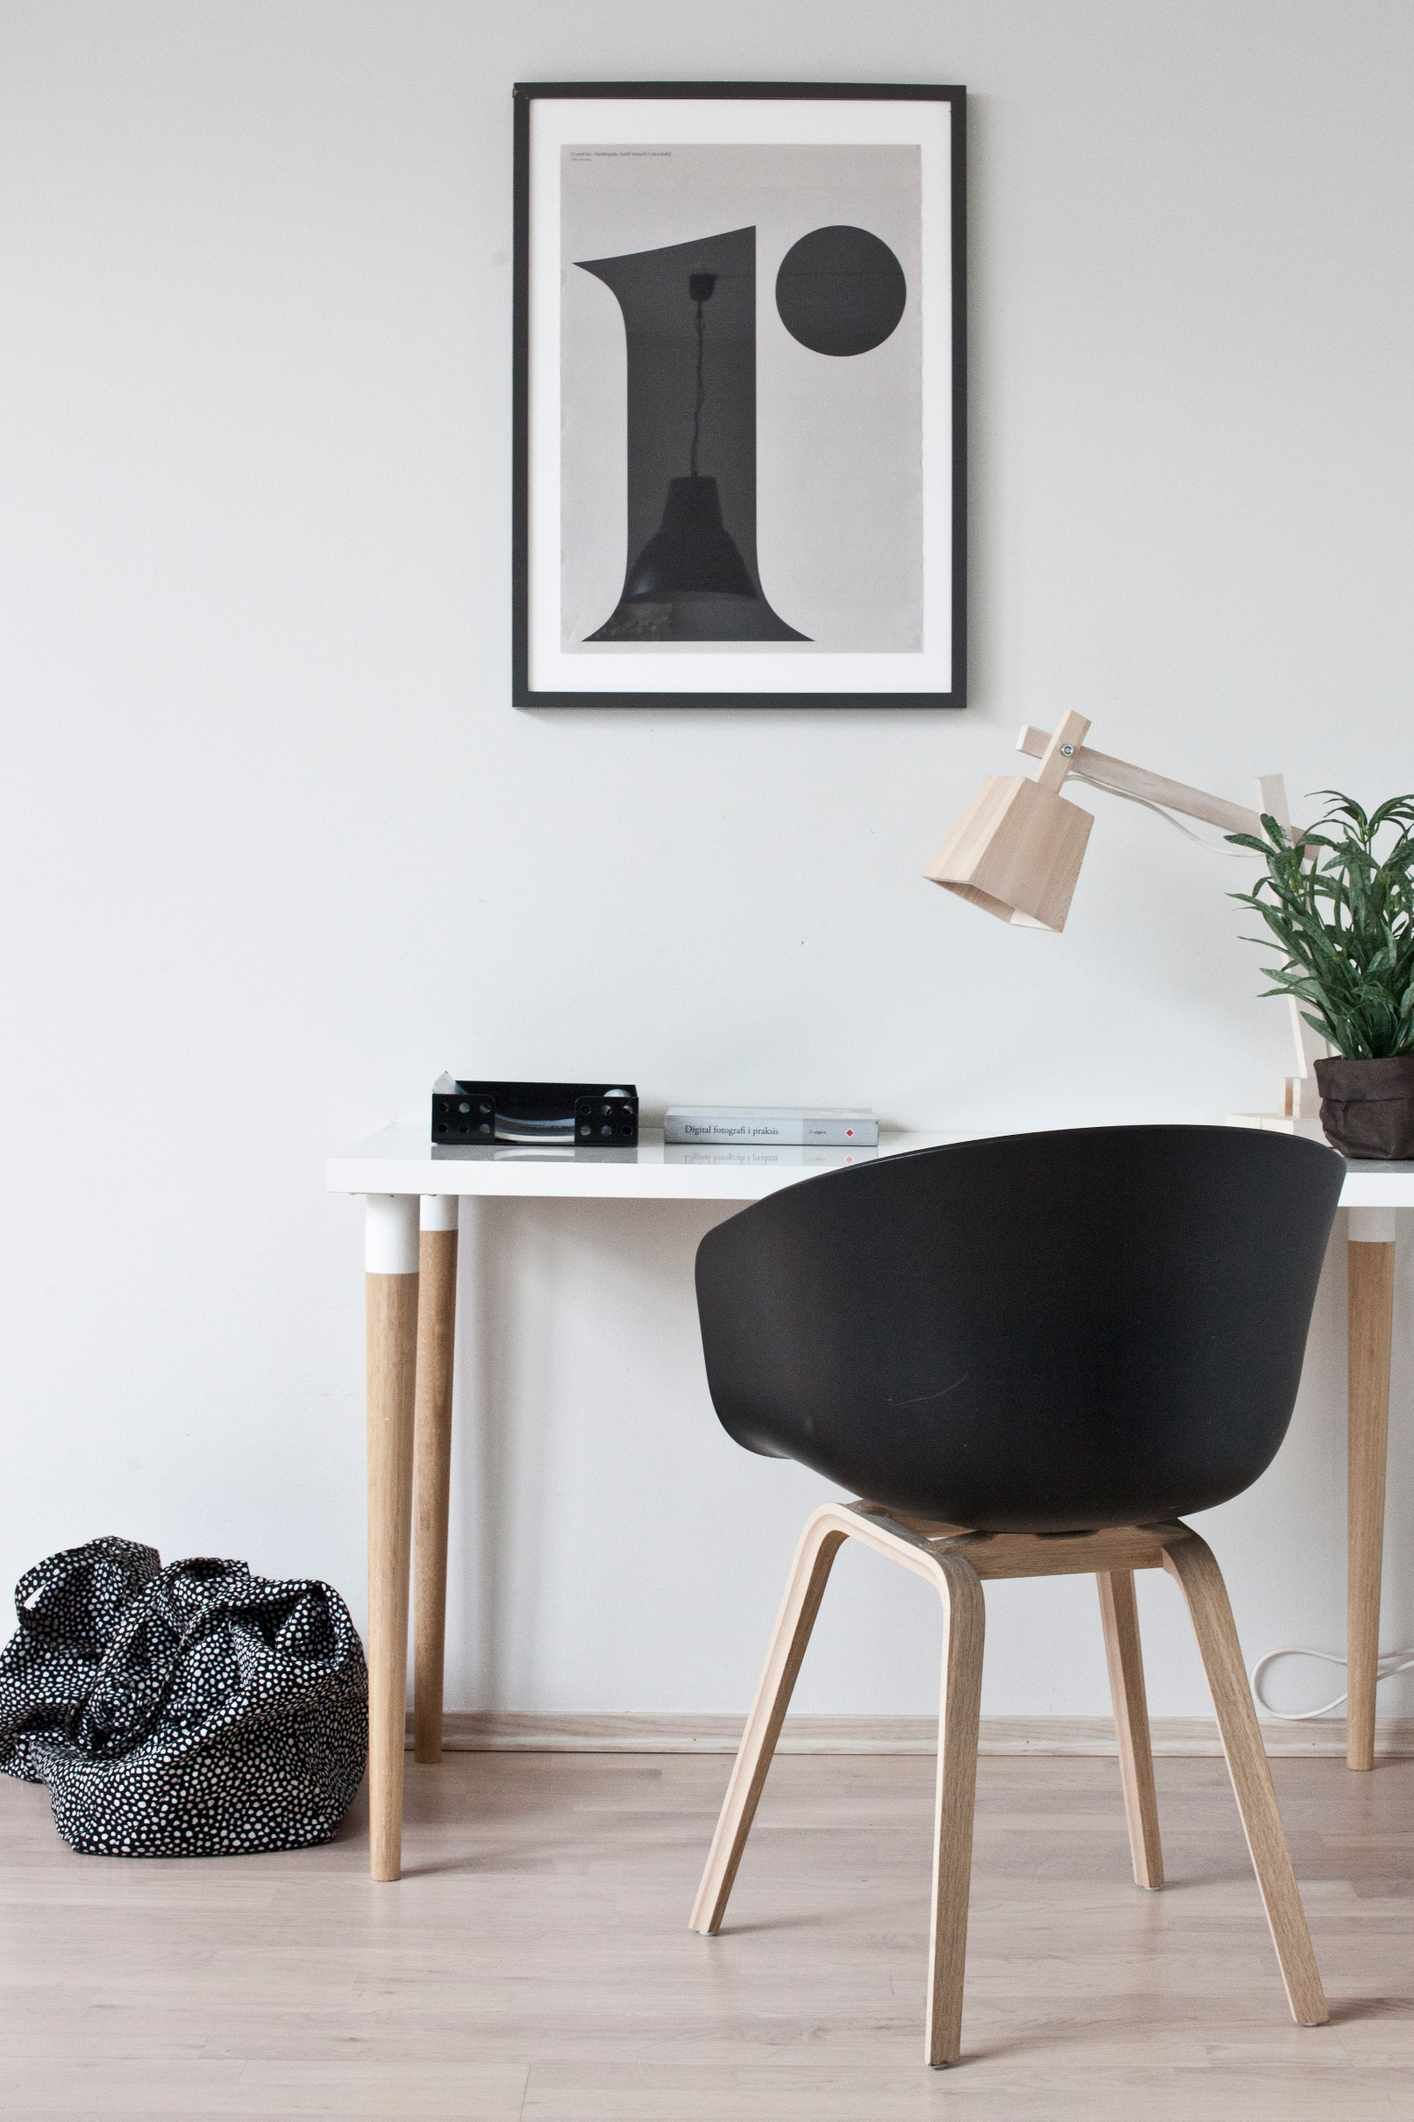 Via Hviit | Scandinavian Home Office | HAY | Playtype | Muuto